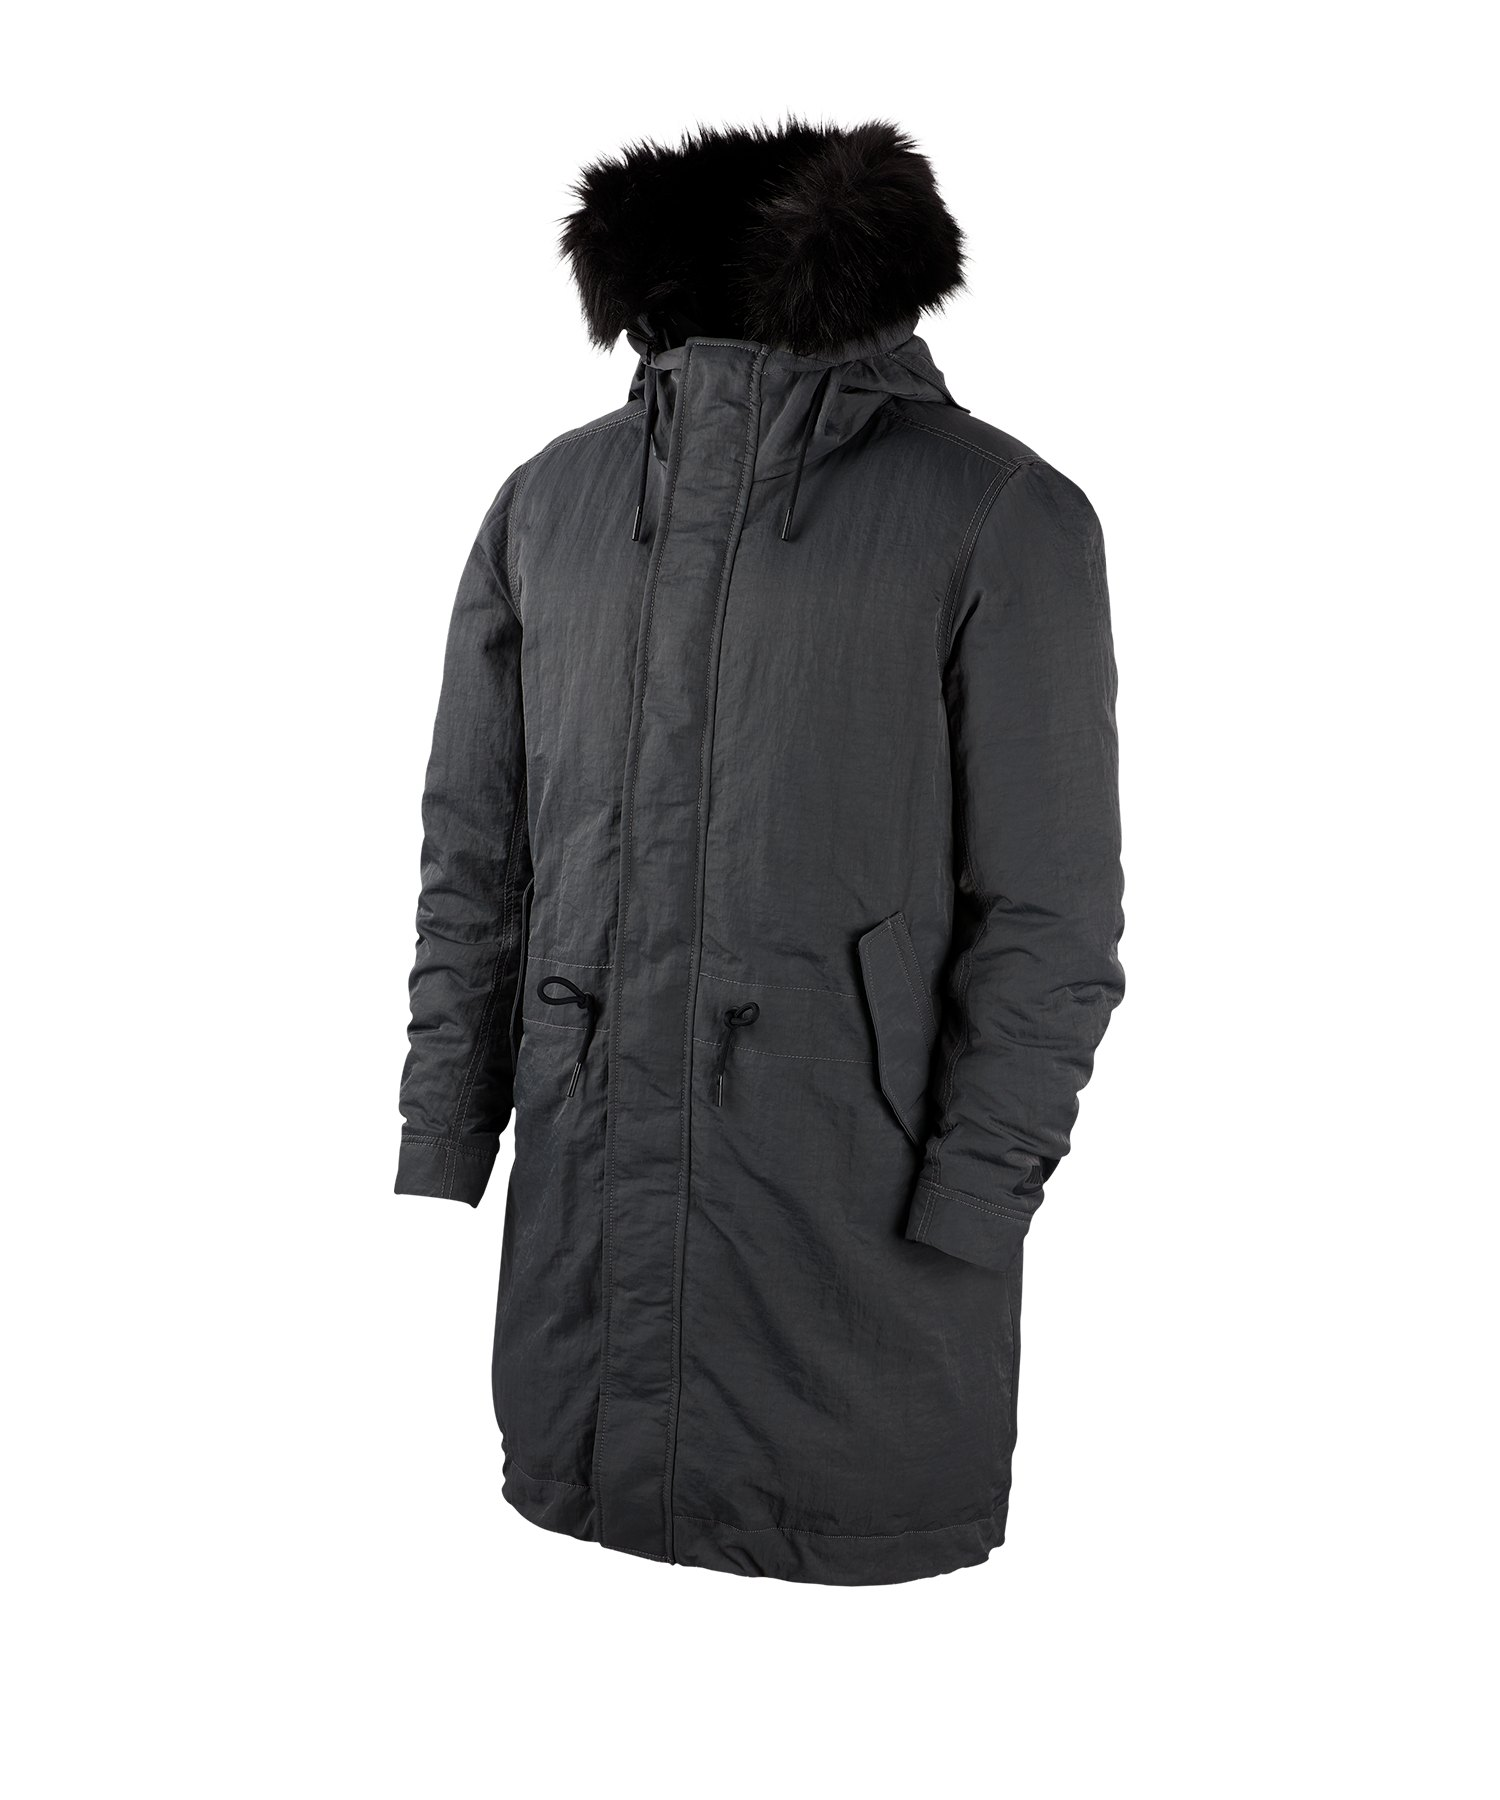 Nike Down-Fill Winterparka Grau F021 - grau